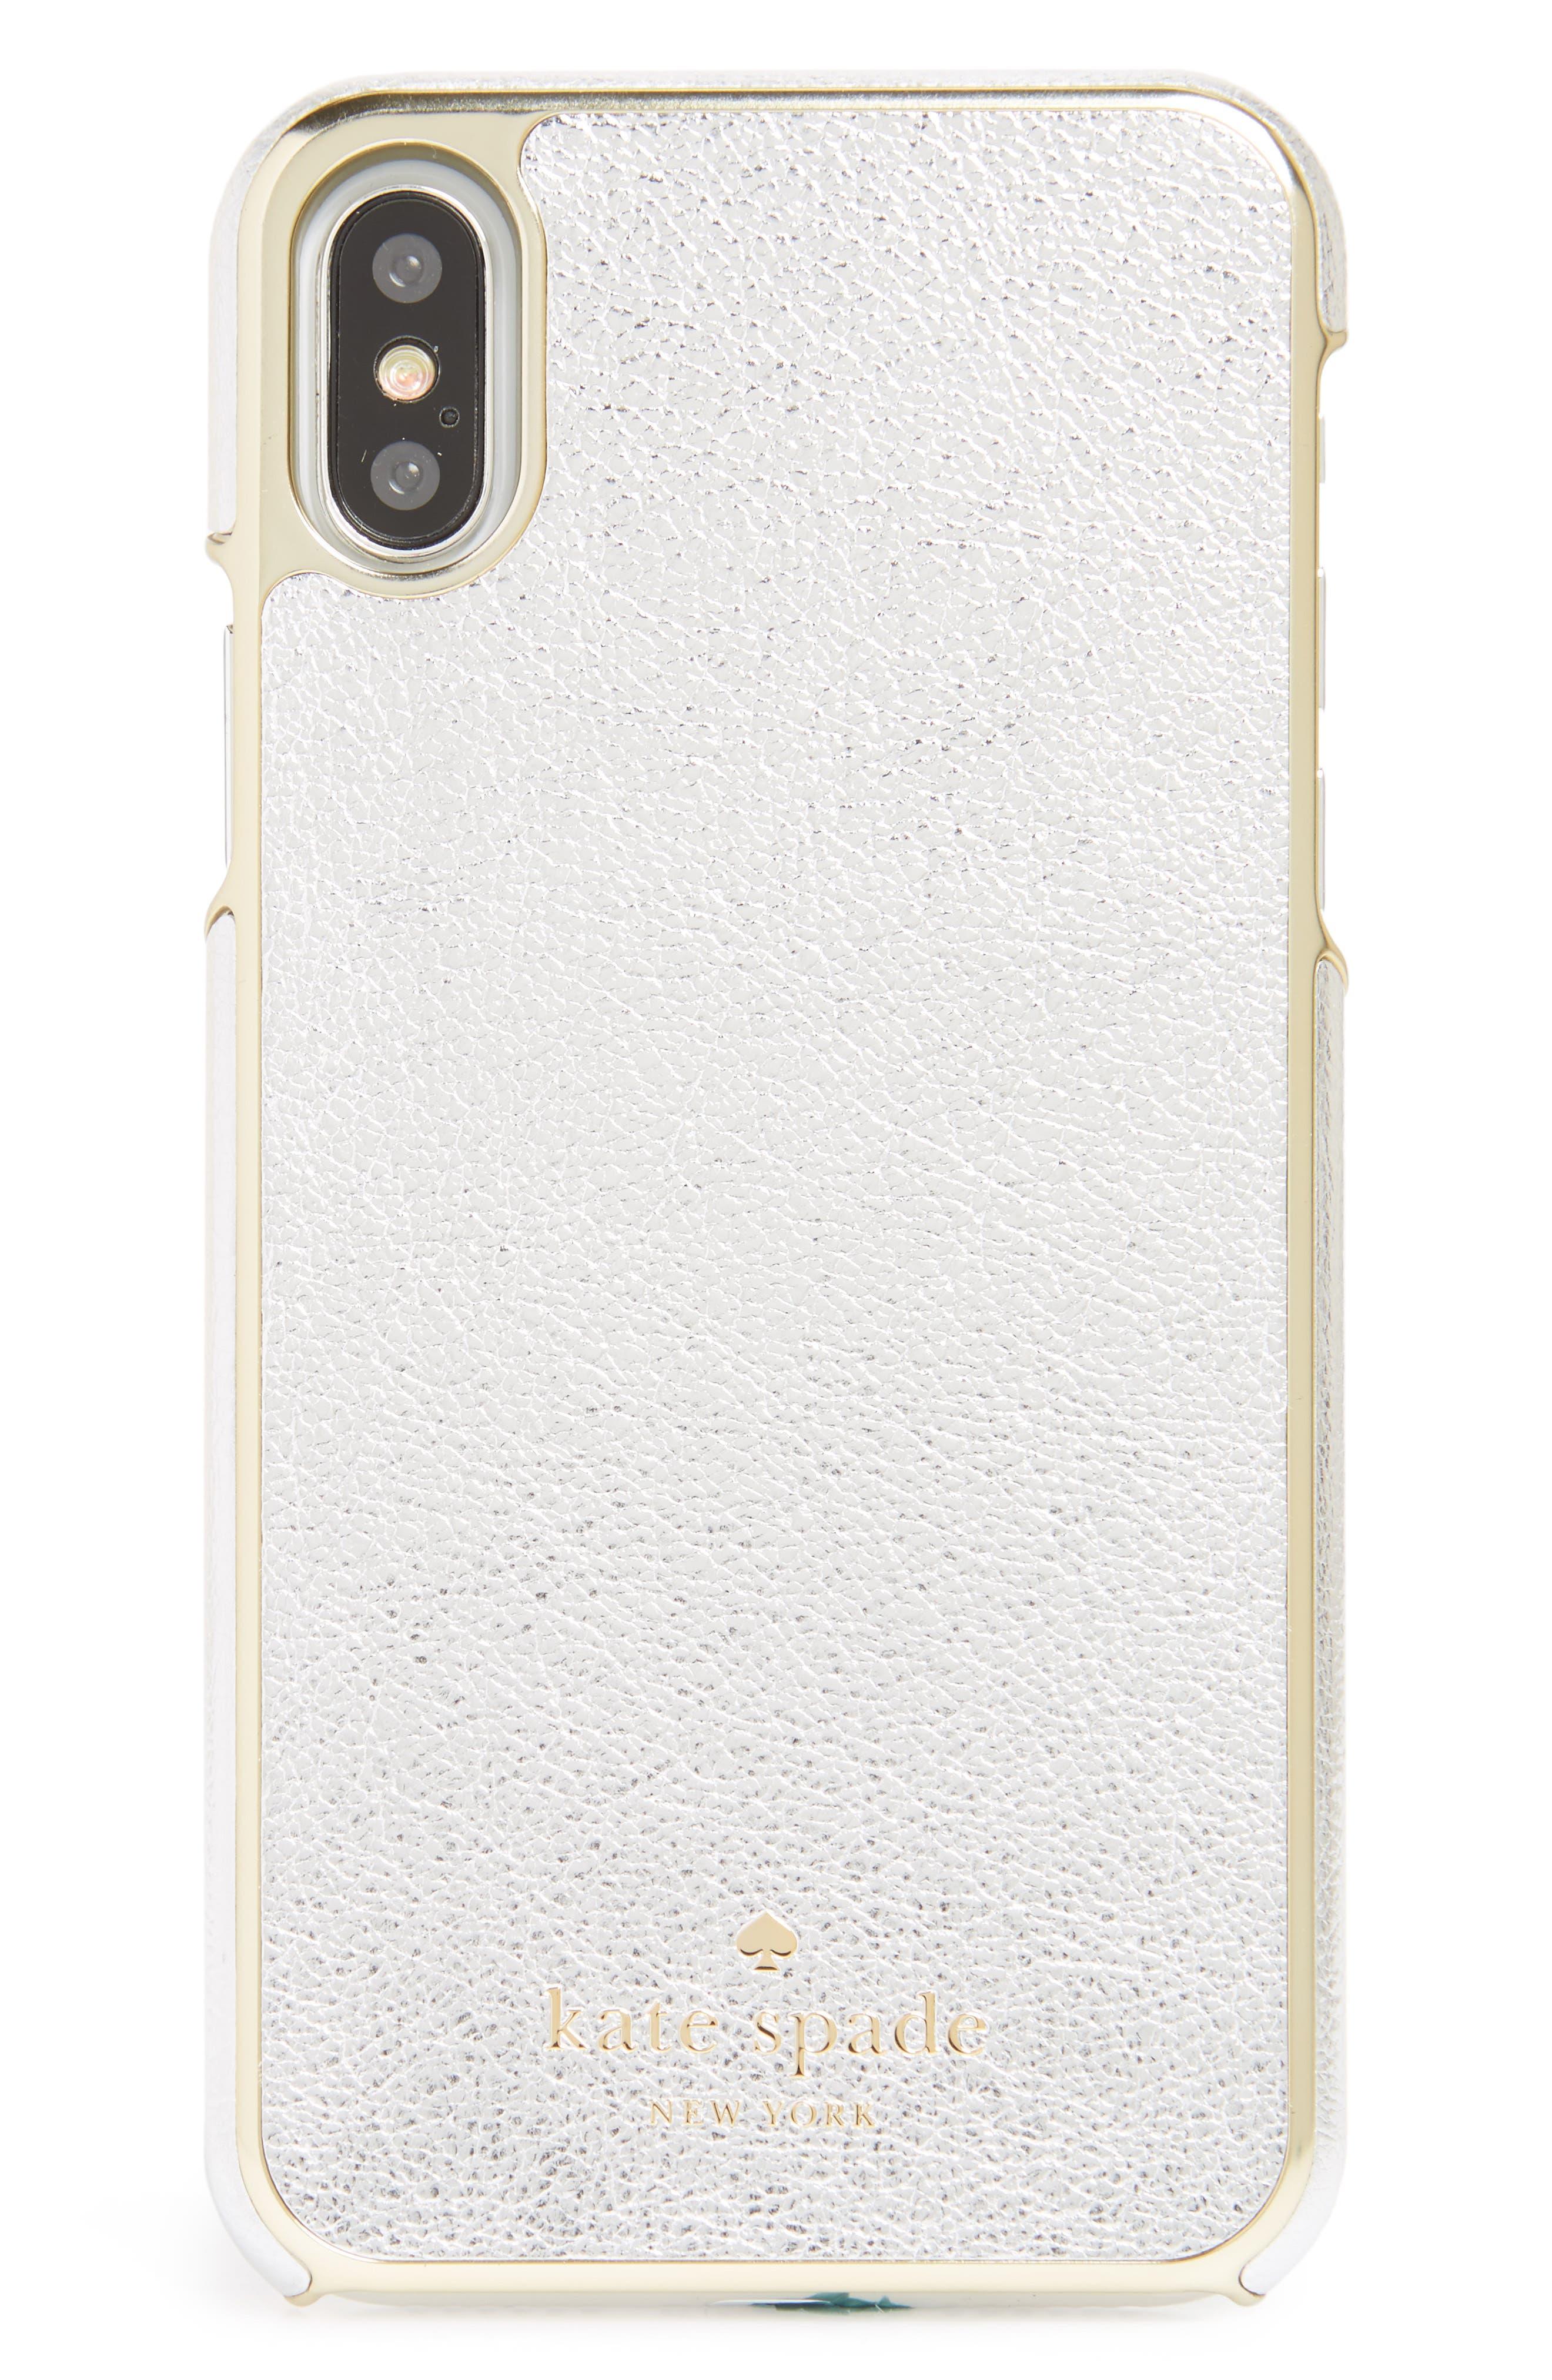 kate spade new york iPhone X case